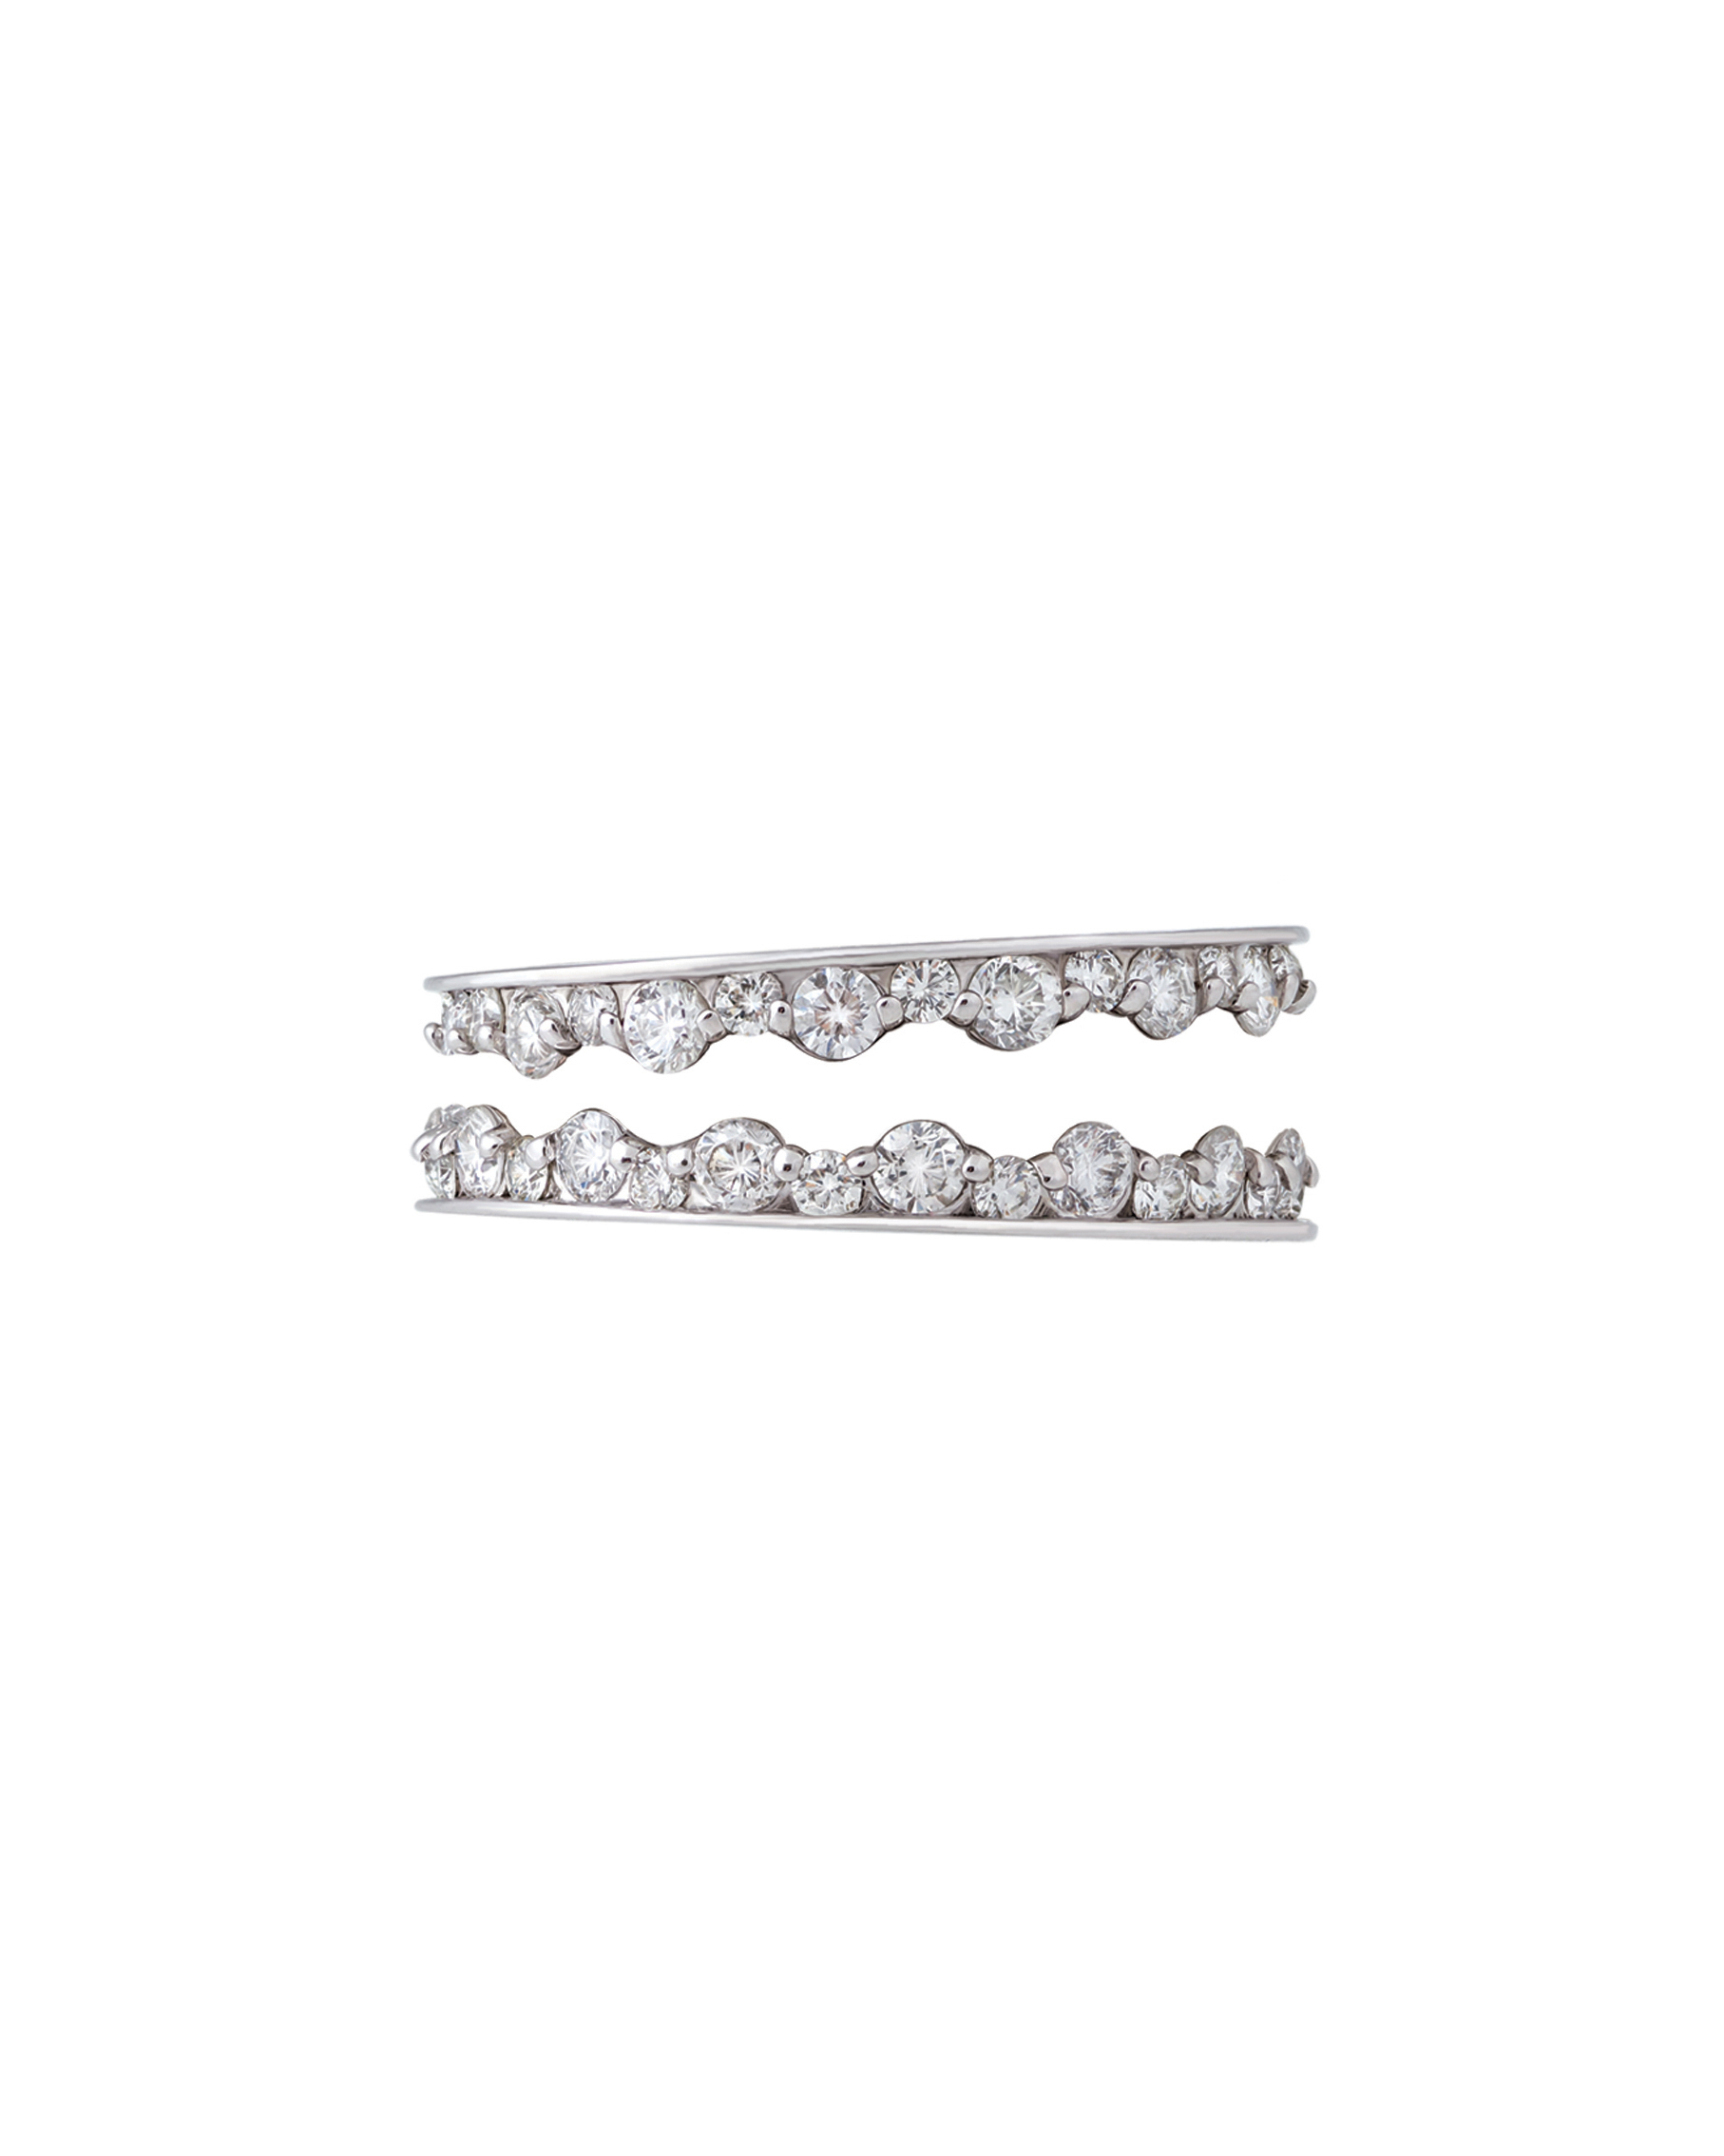 designer diamond bridal jewelry-3.jpg